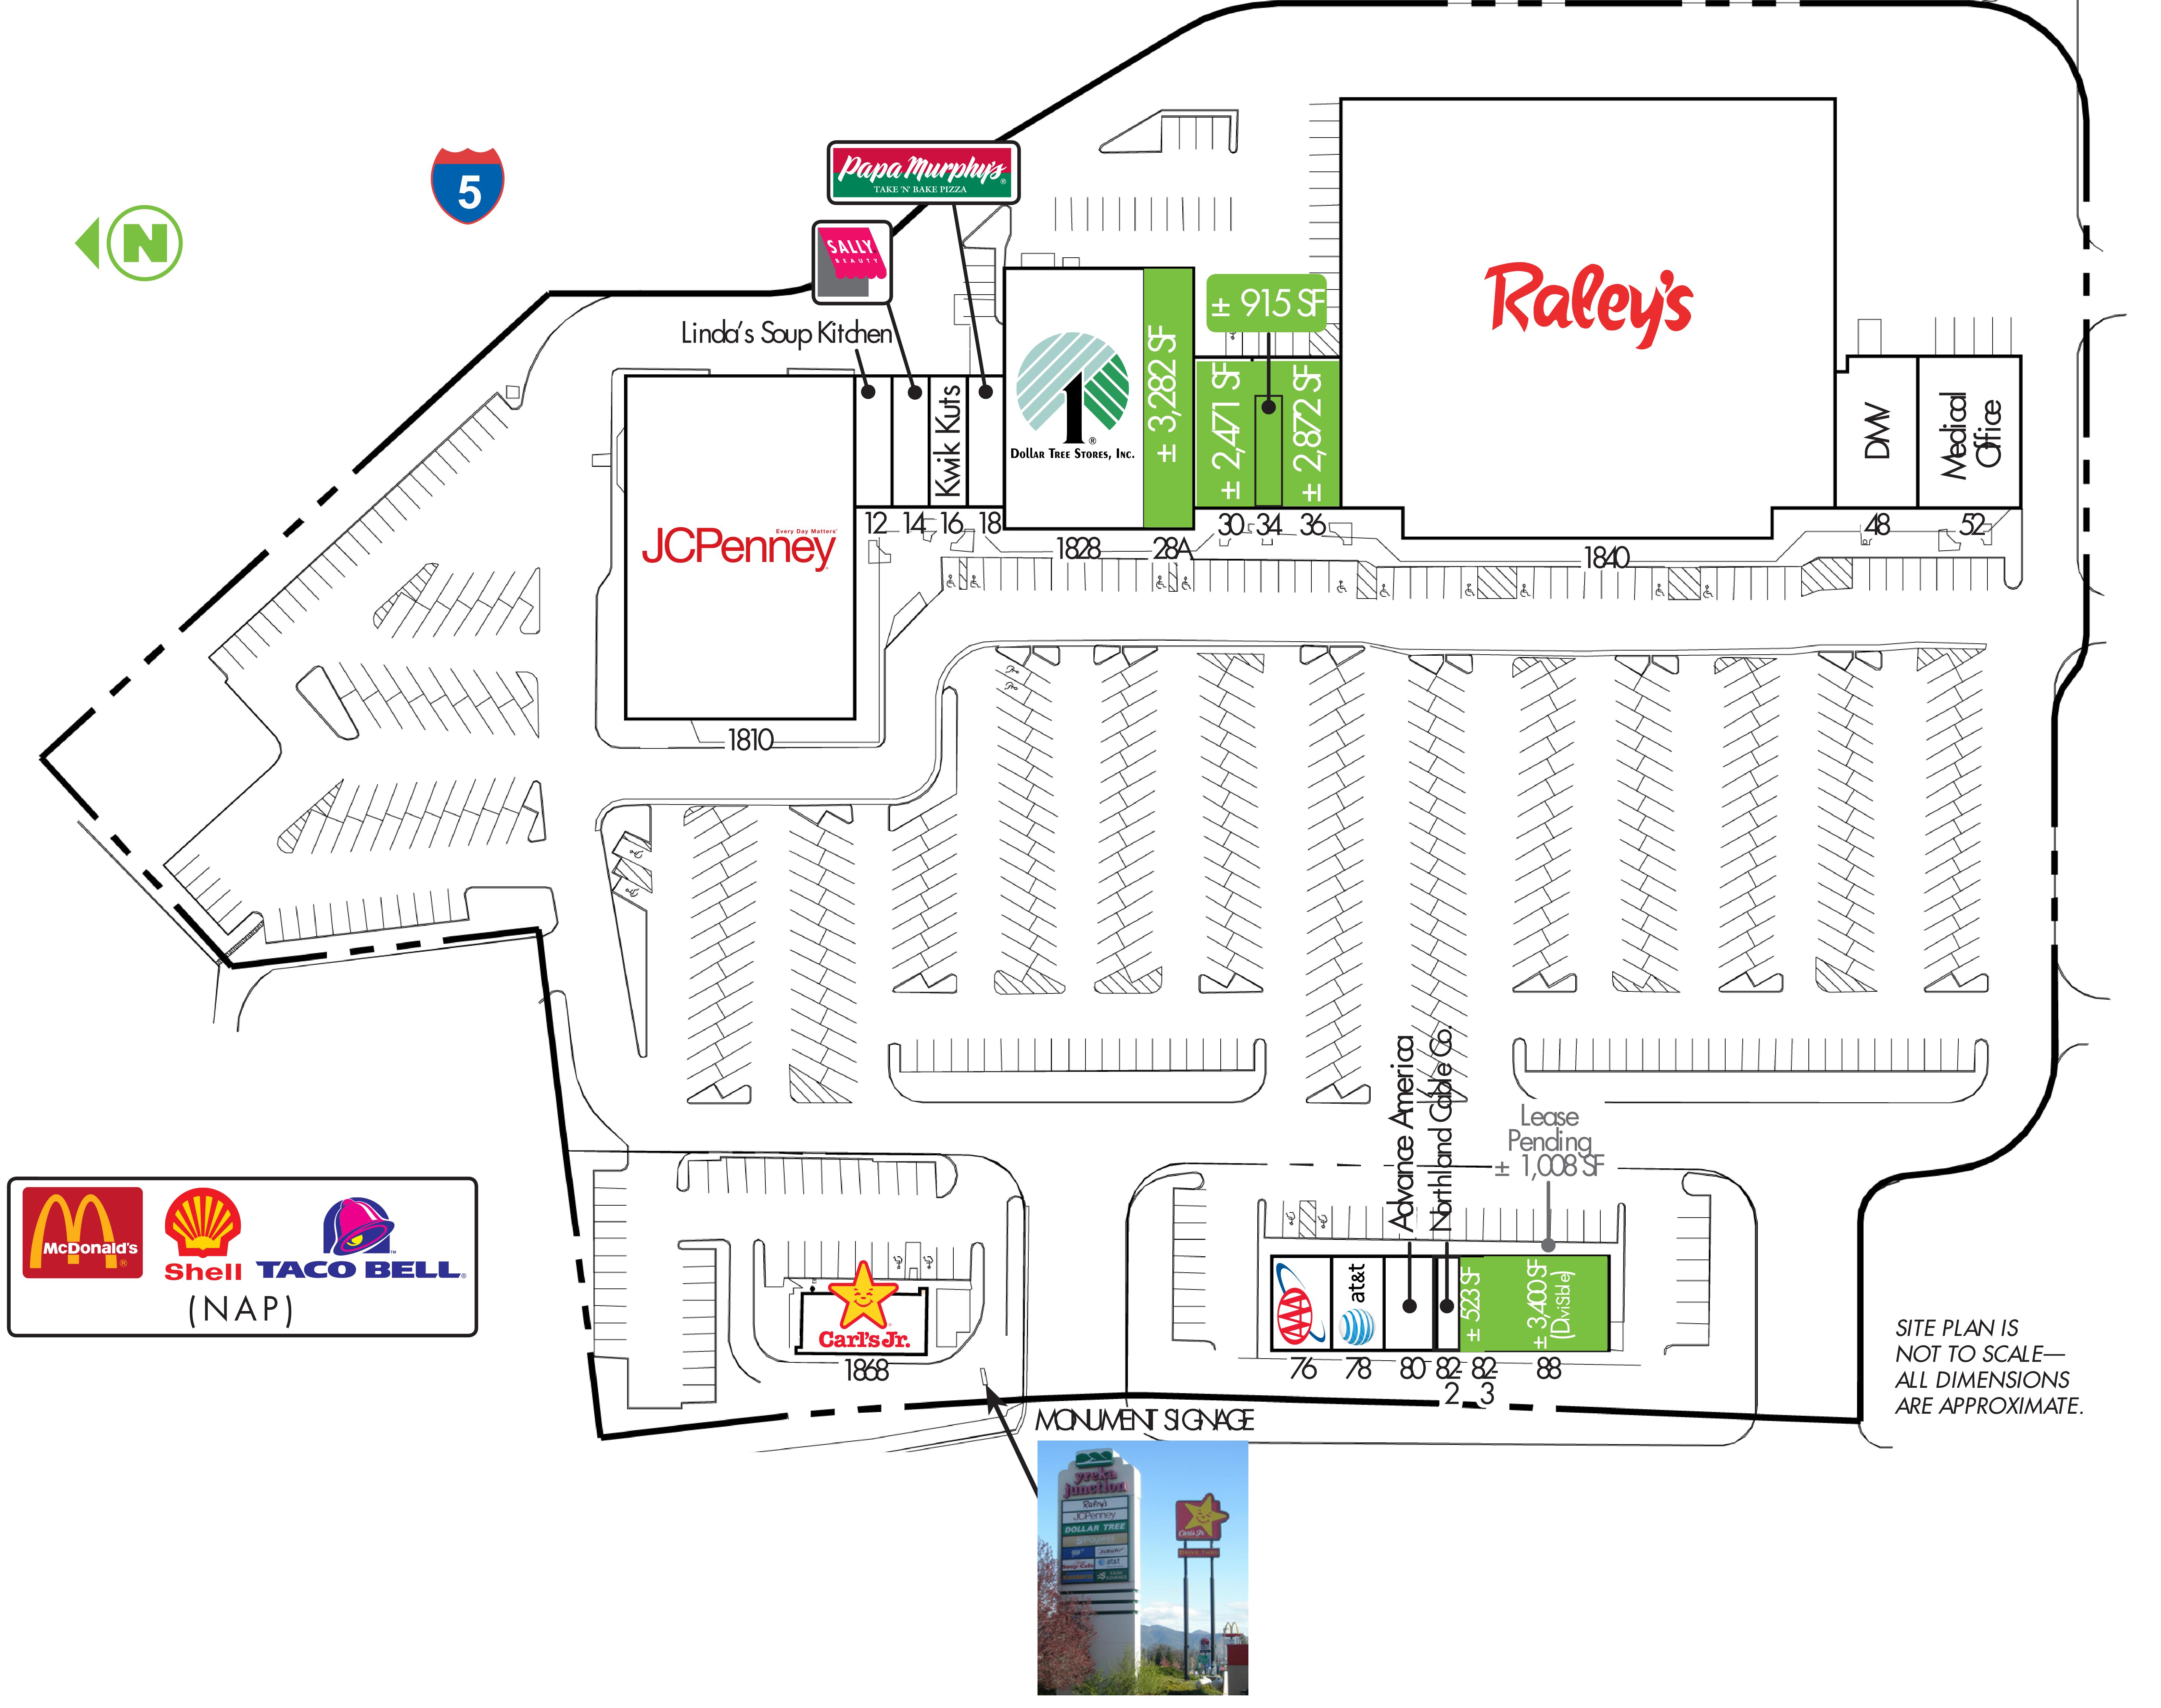 Yreka Junction: site plan